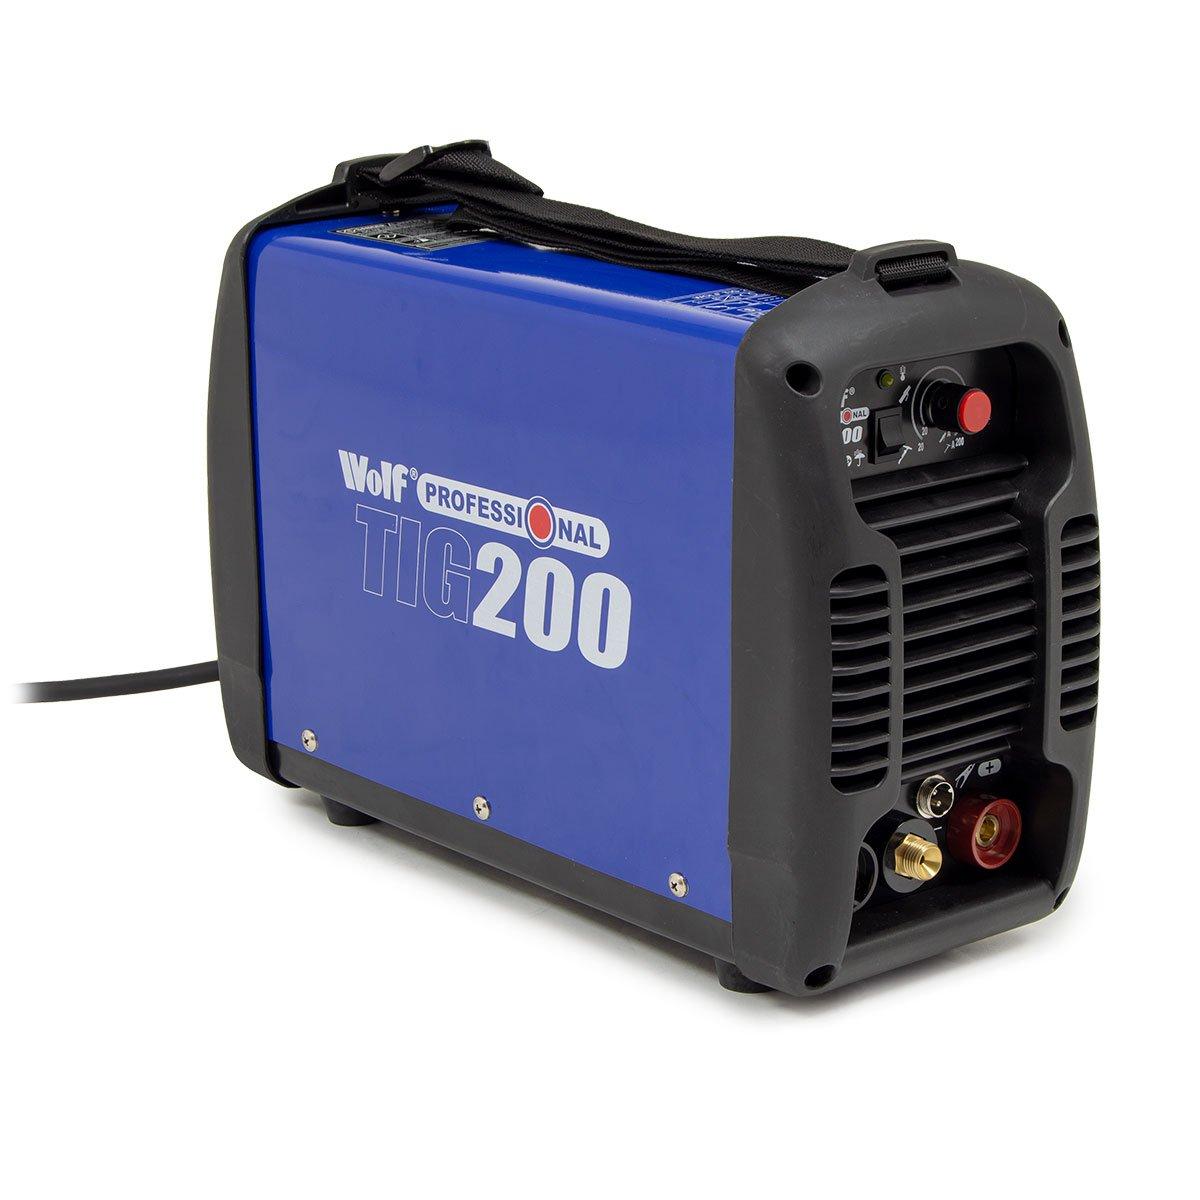 Wolf Professional Tig Arc Stick MMA 200 DC Welder 30 Amp - 200 Amps Range